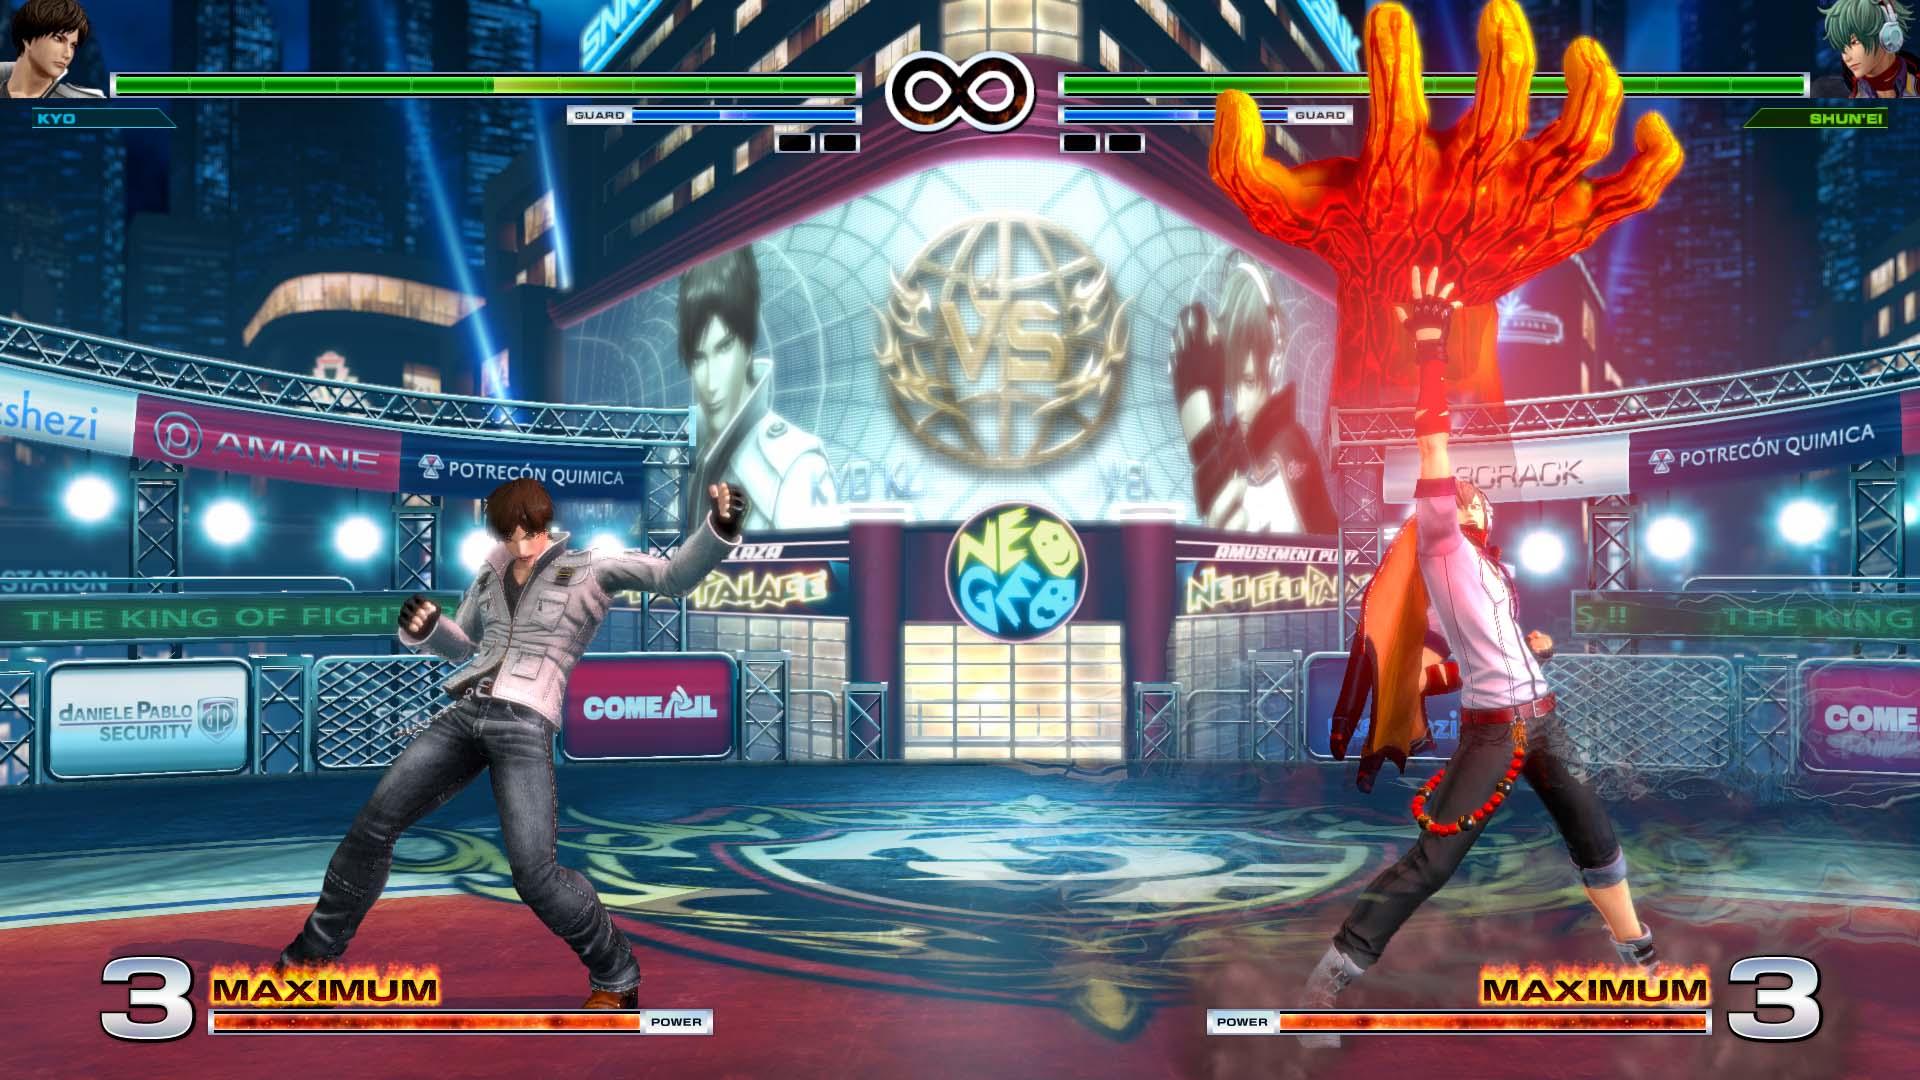 KOFXIV - Kyo vs Shun'ei